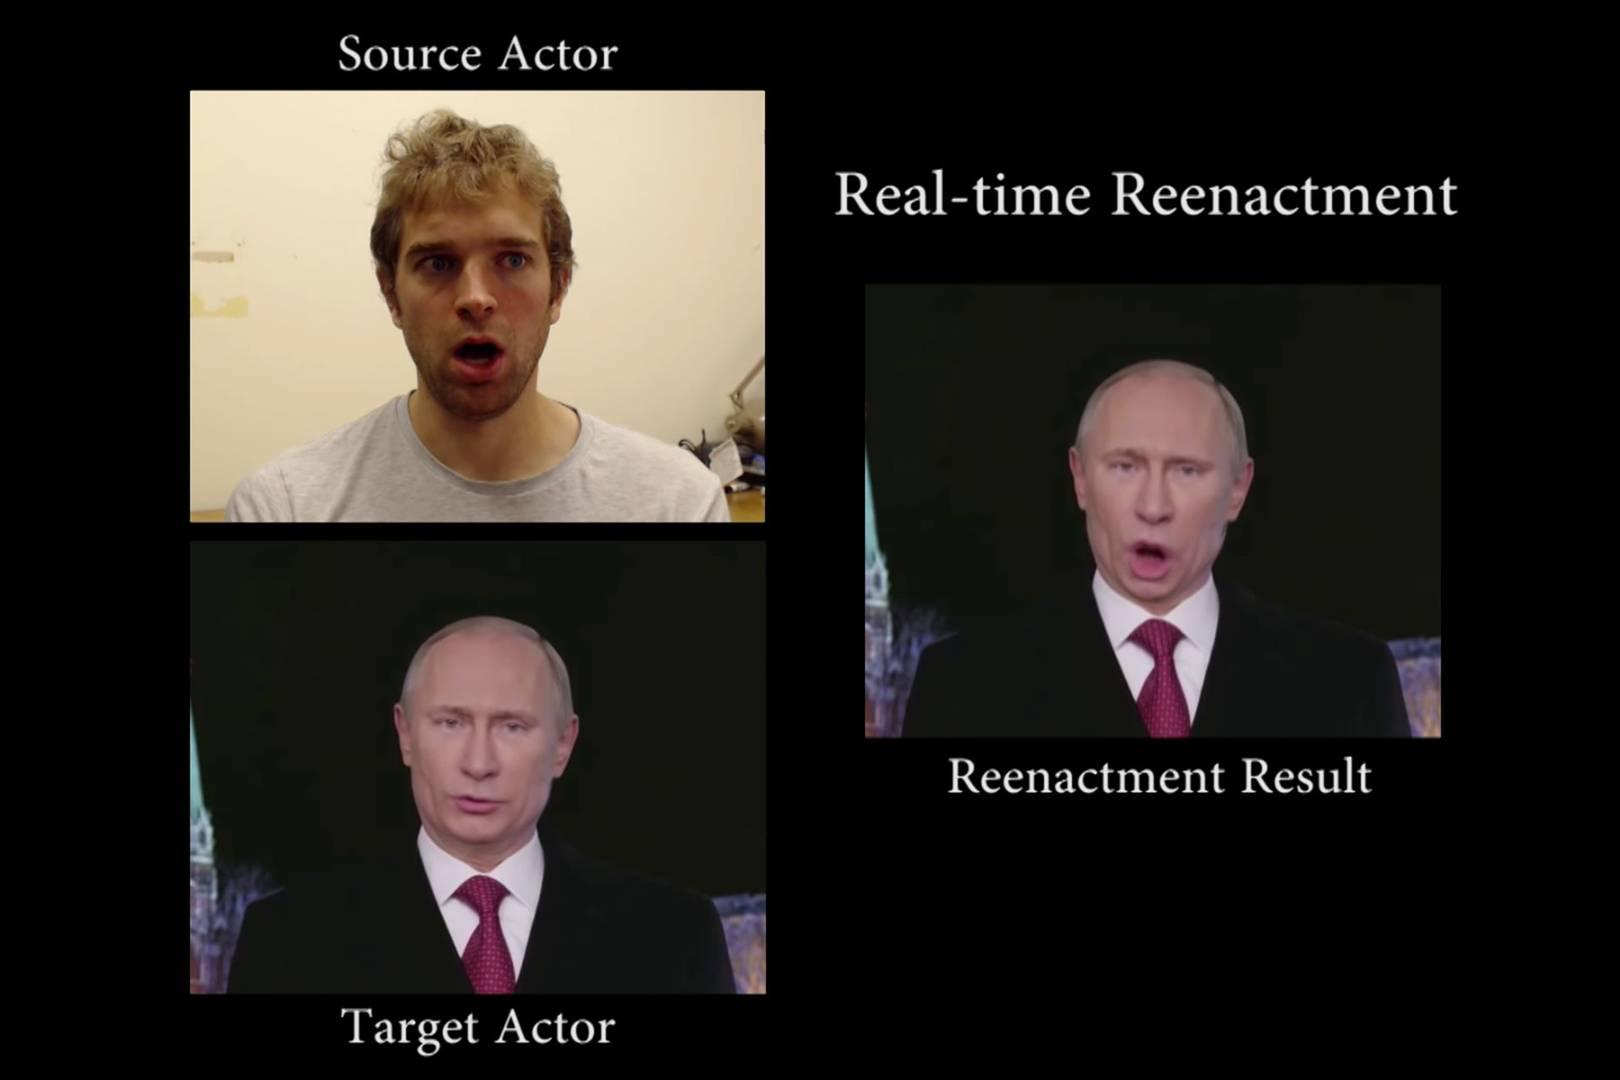 Webcam w facial recognition — 9